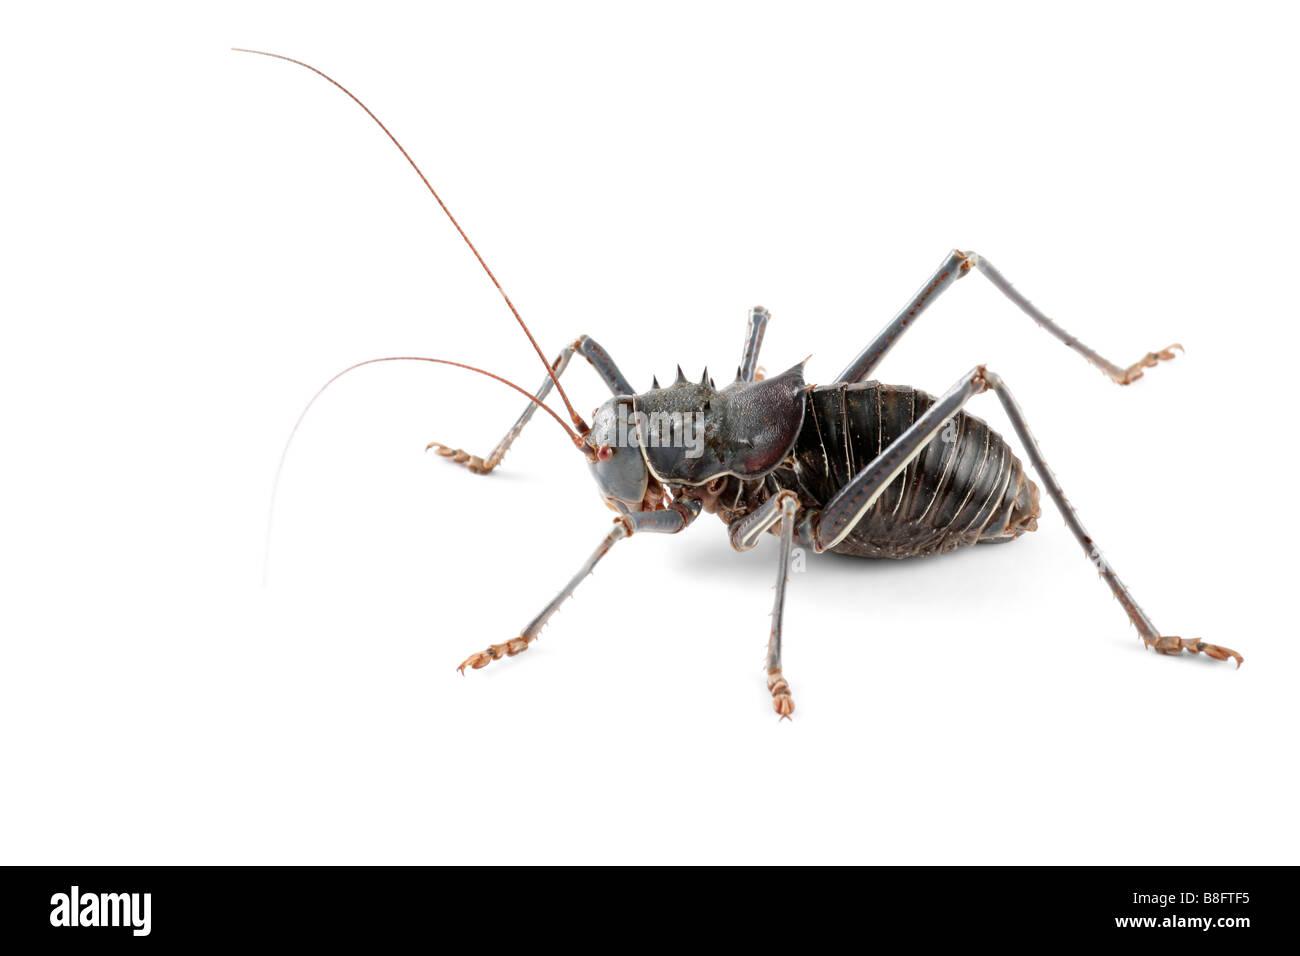 An African Armoured ground cricket (Family Bradyporidae) on white - Stock Image